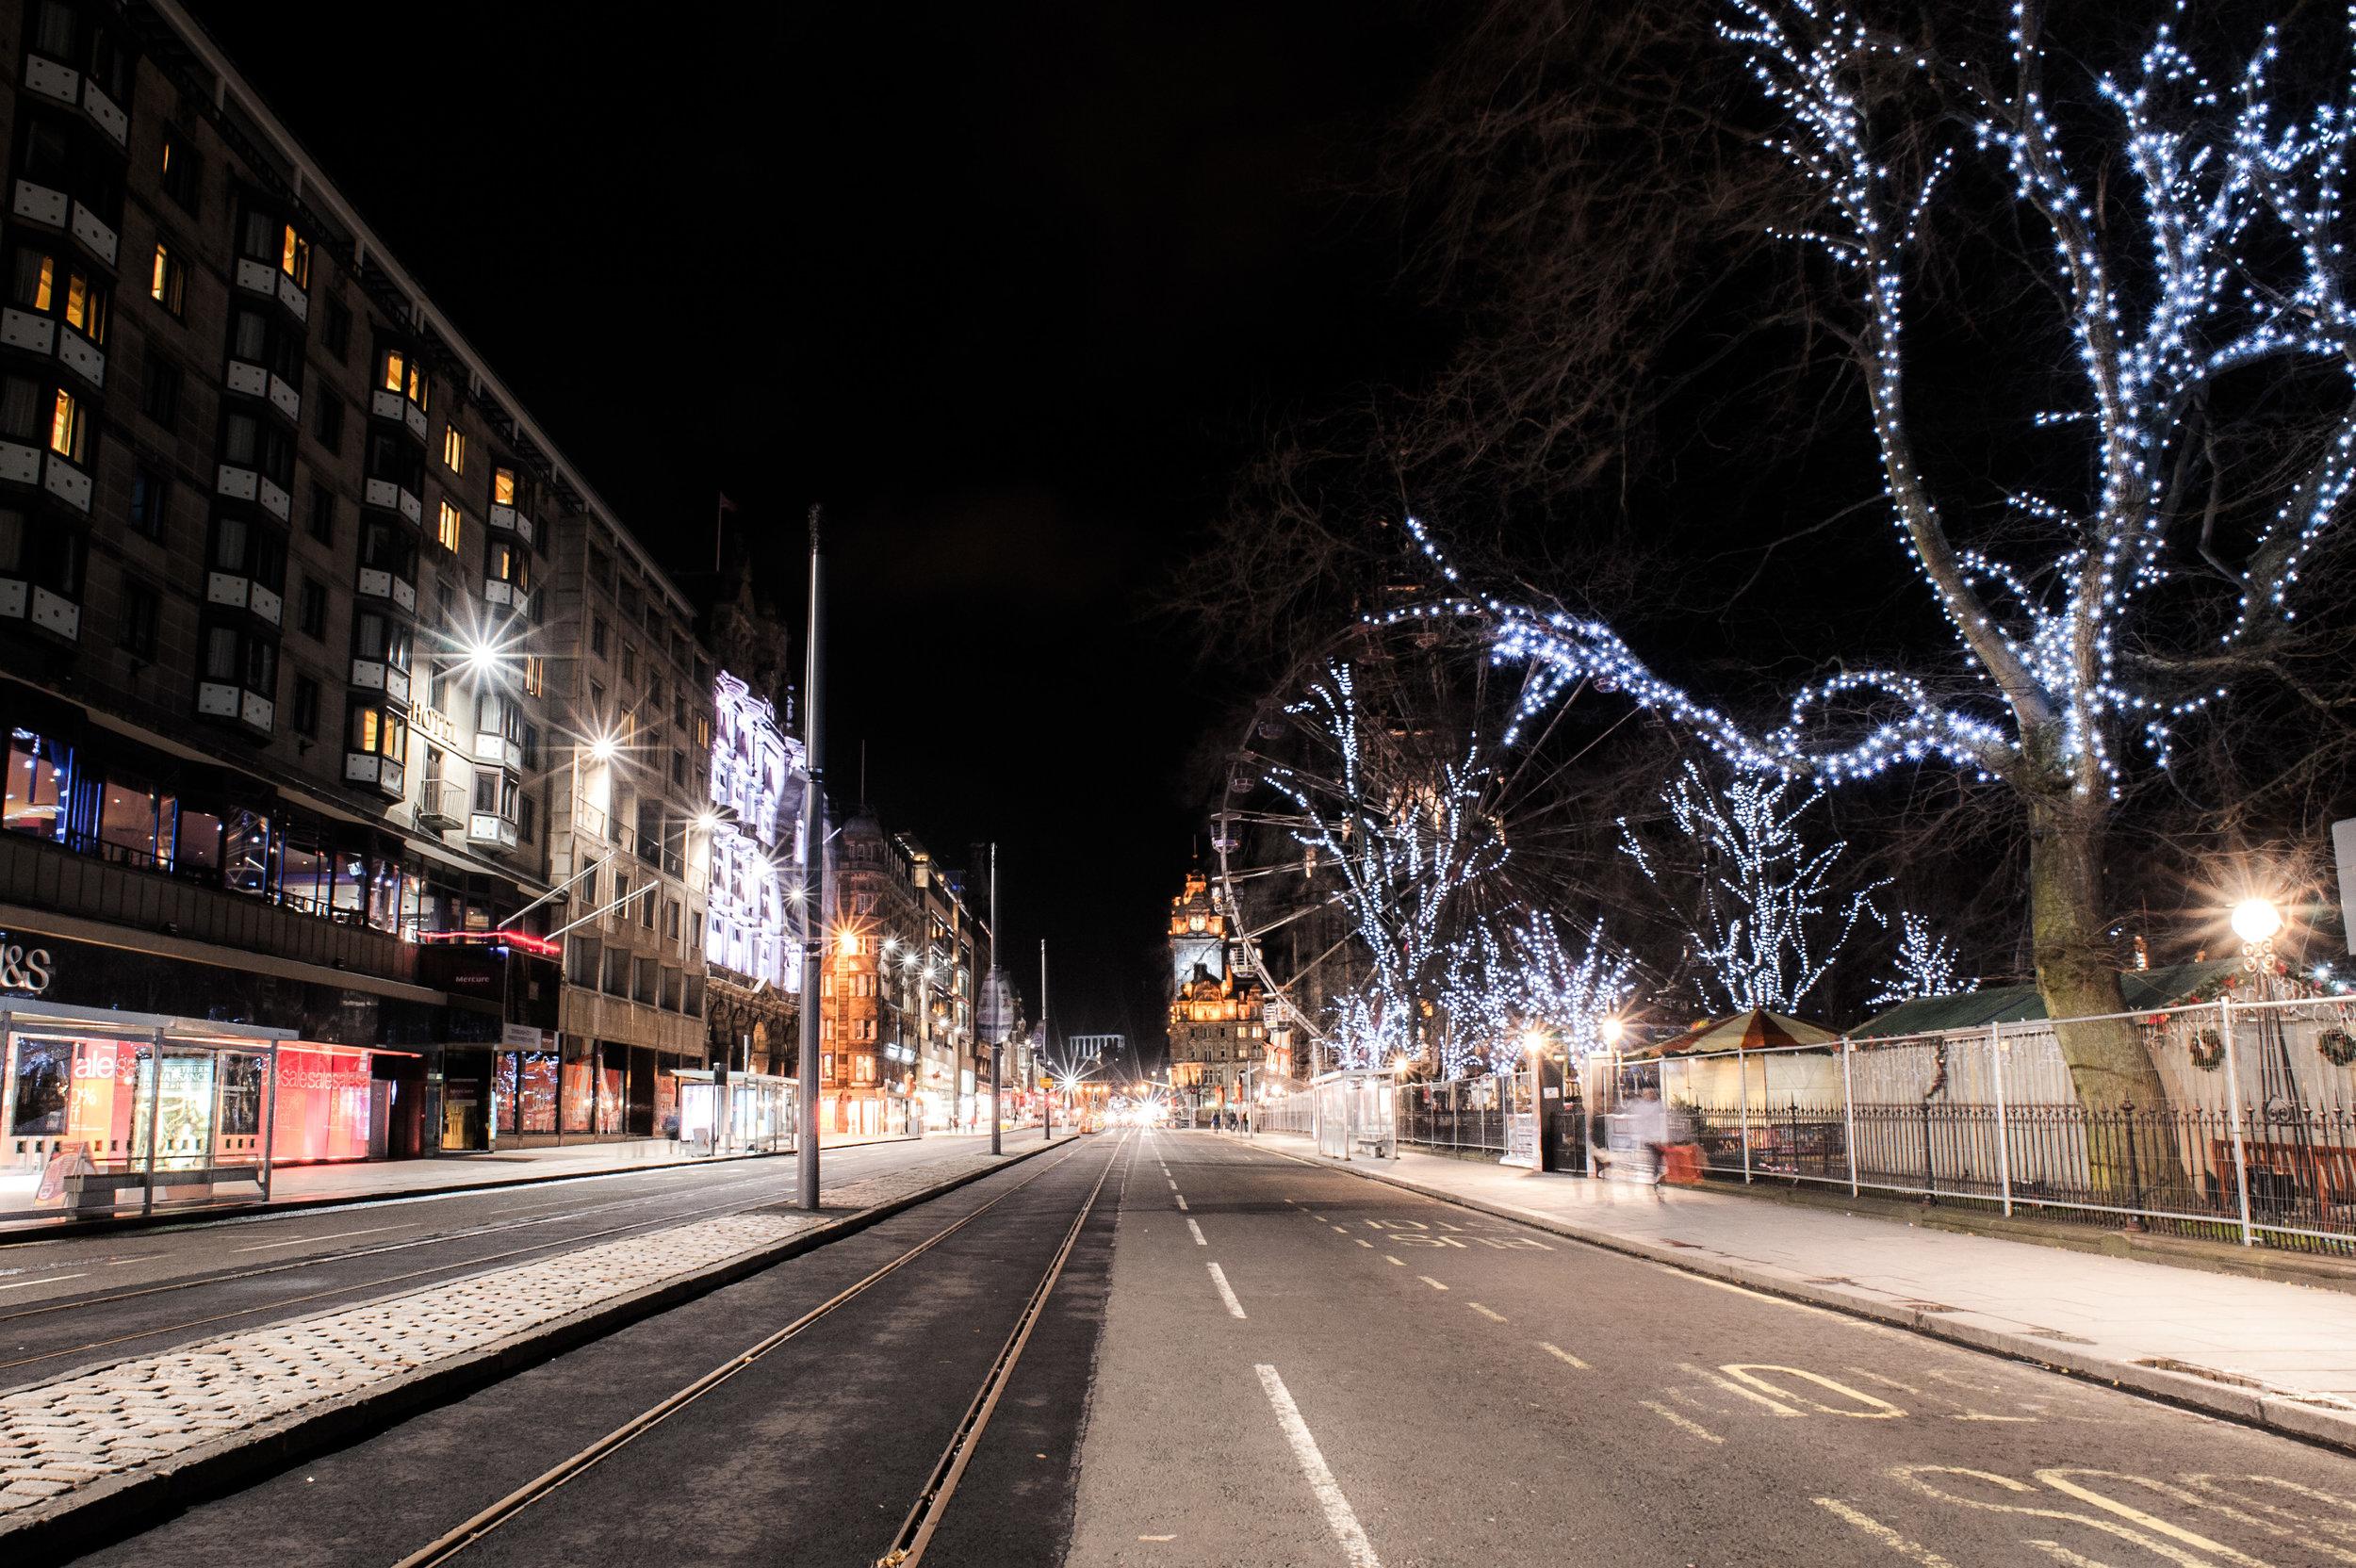 Princes street - Edinburgh - Scotland